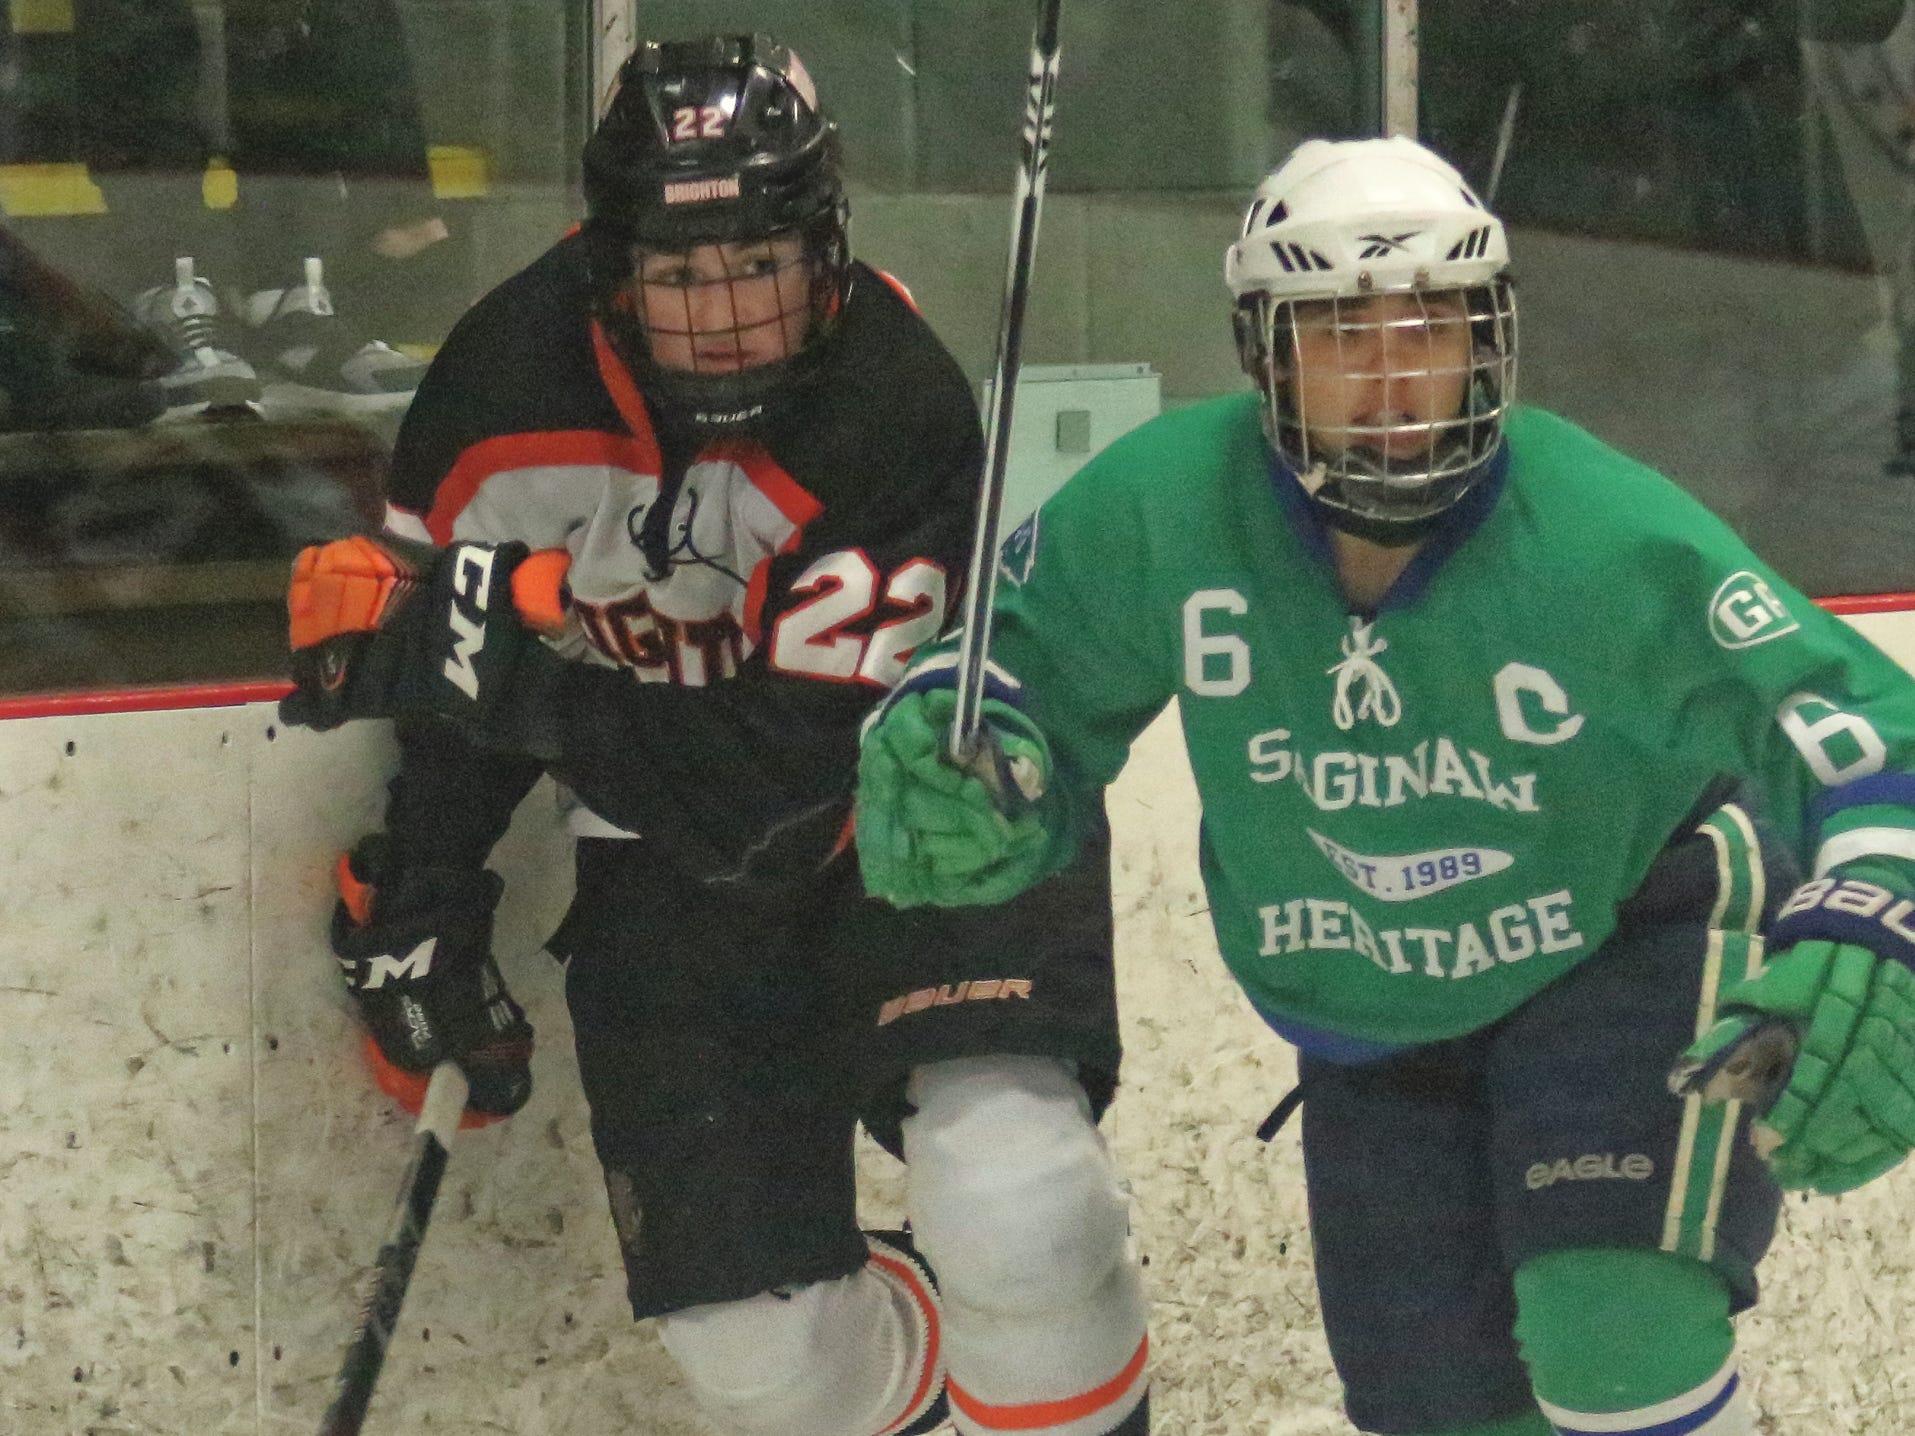 Saginaw Heritage stuns Brighton, 7-1, in state hockey final rematch